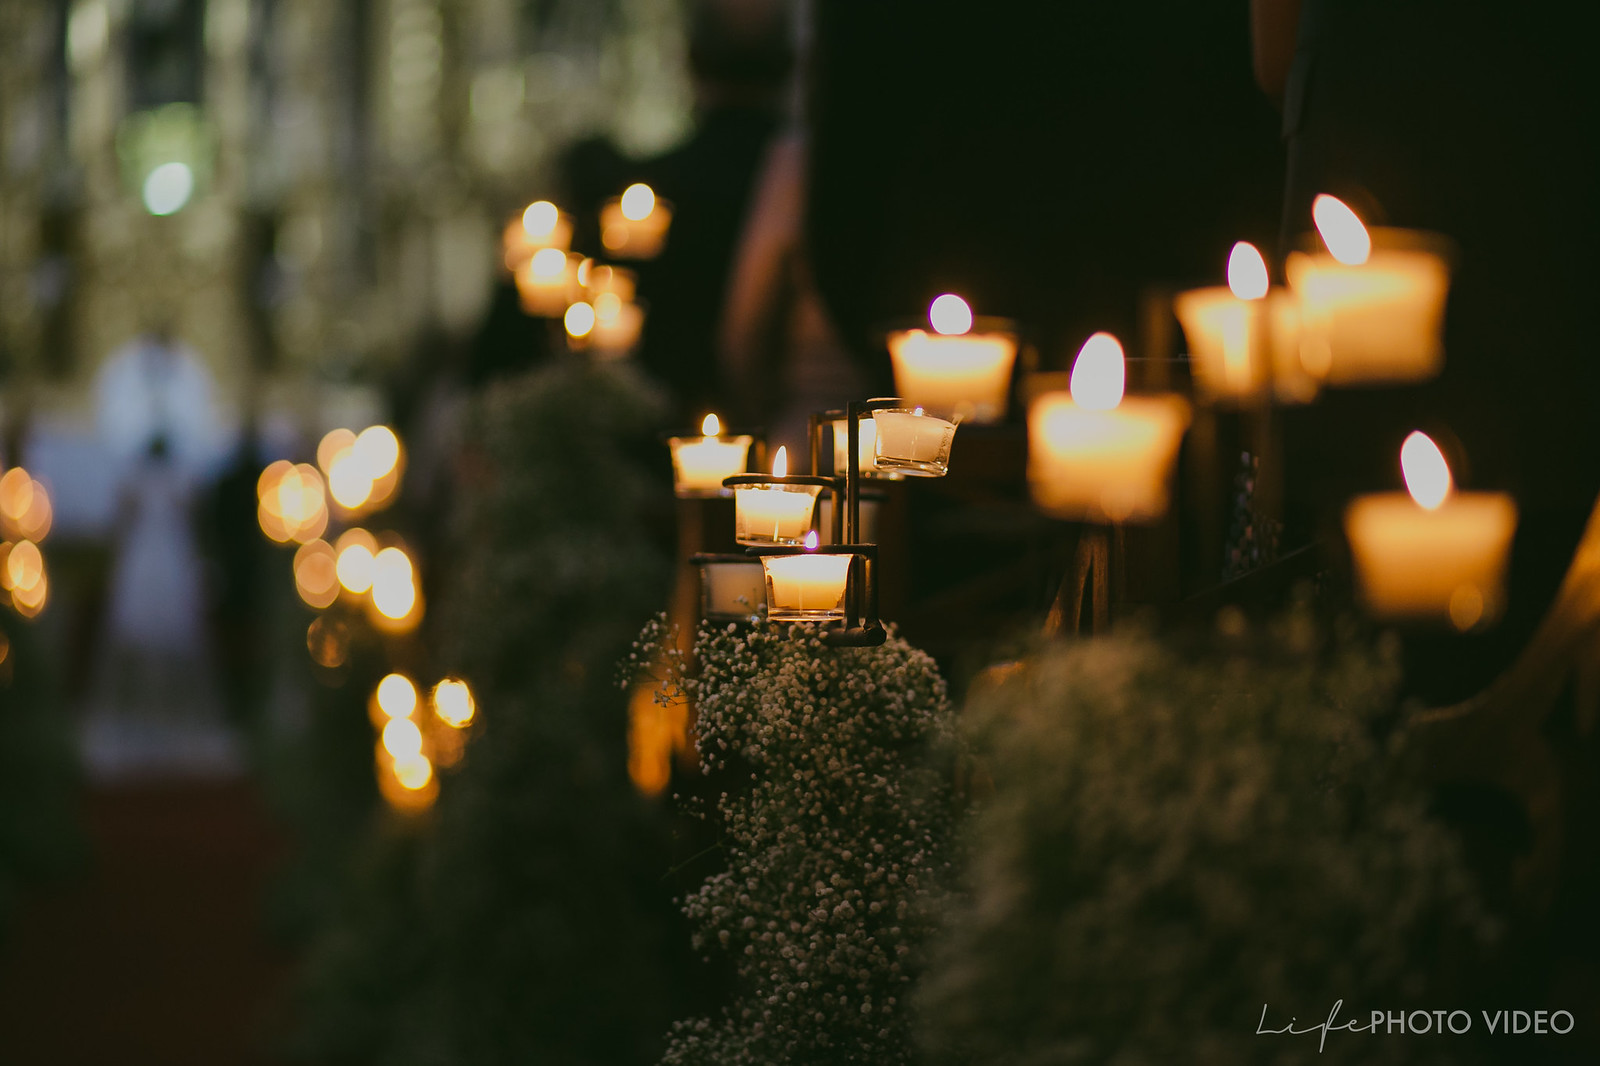 LifePhotoVideo_Boda_Guanajuato_Wedding_0034